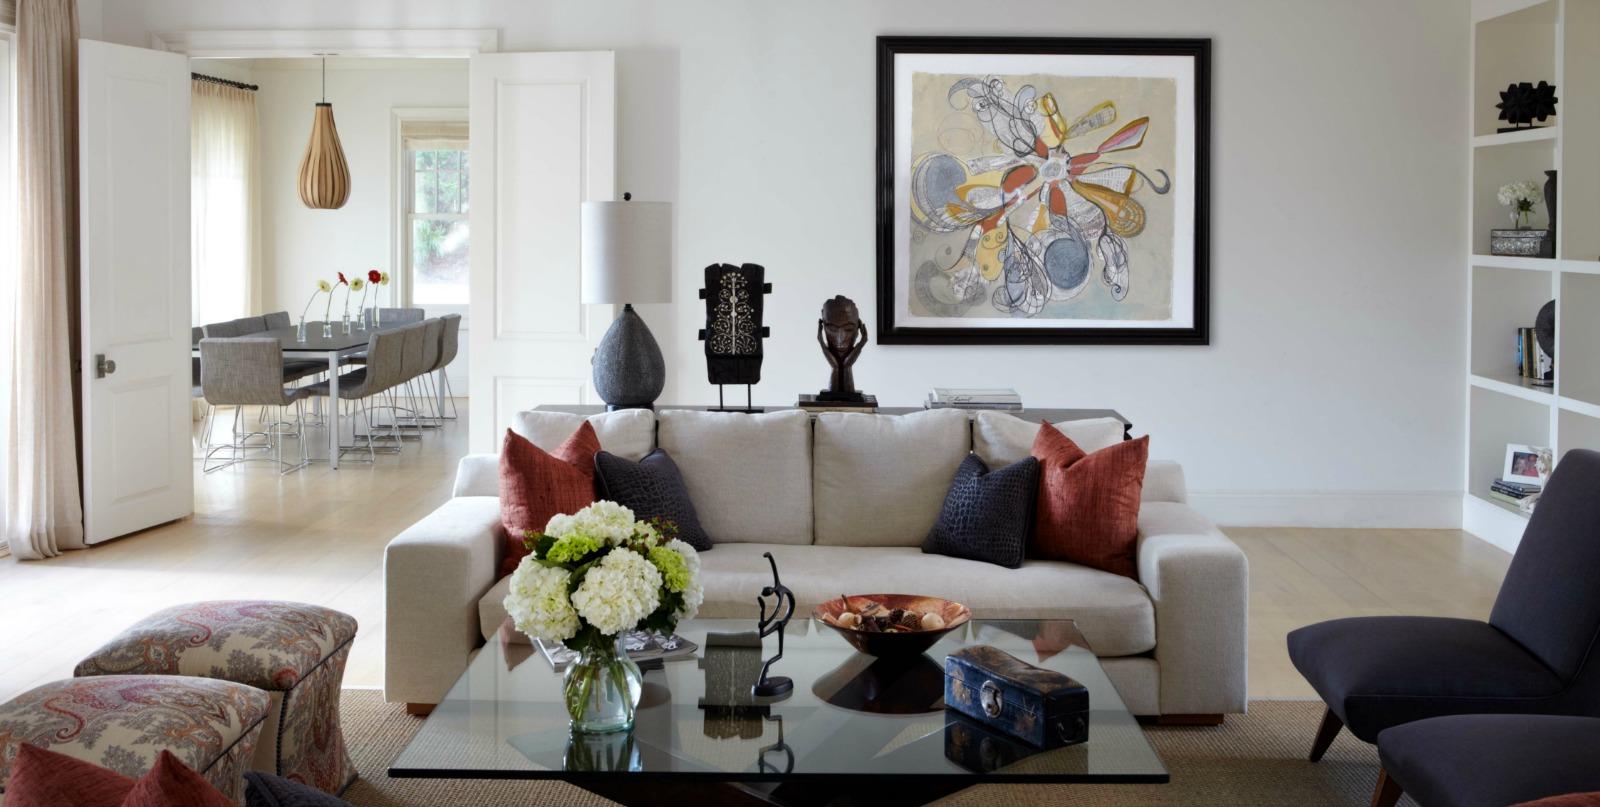 Top Long Island interior designer Jody Sokol